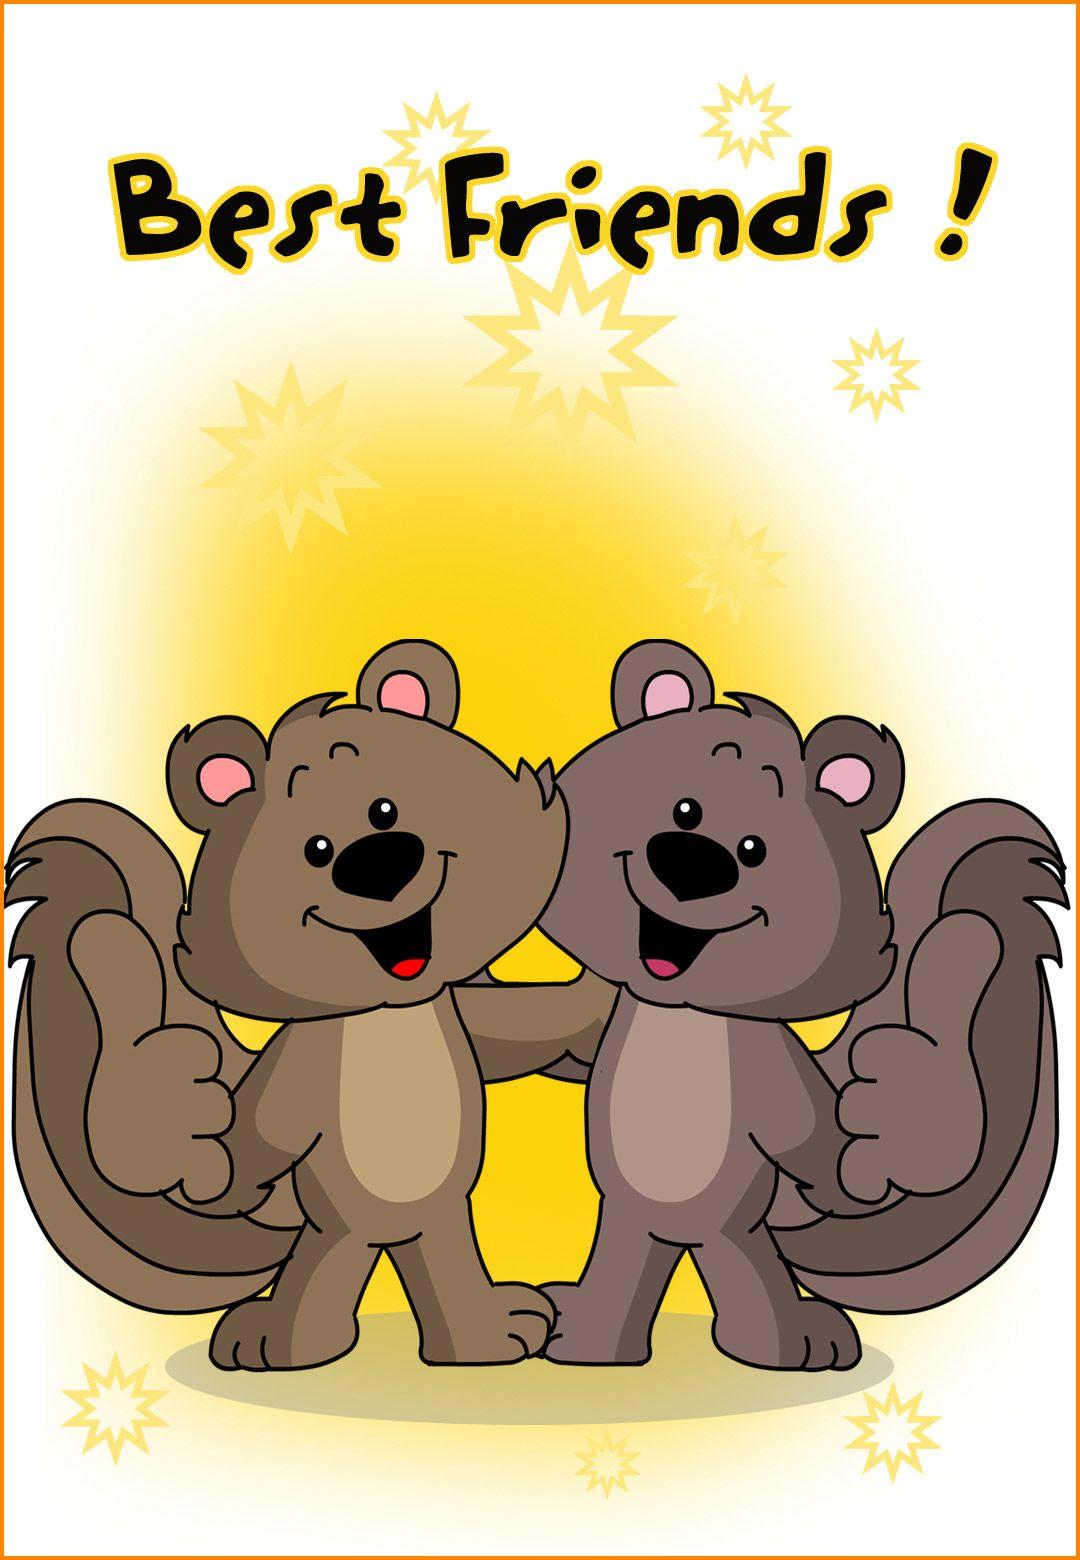 Free Printable Friendship Card Best Friends Greetings Island Best Birthday Wishes Friend Friendship Birthday Wishes